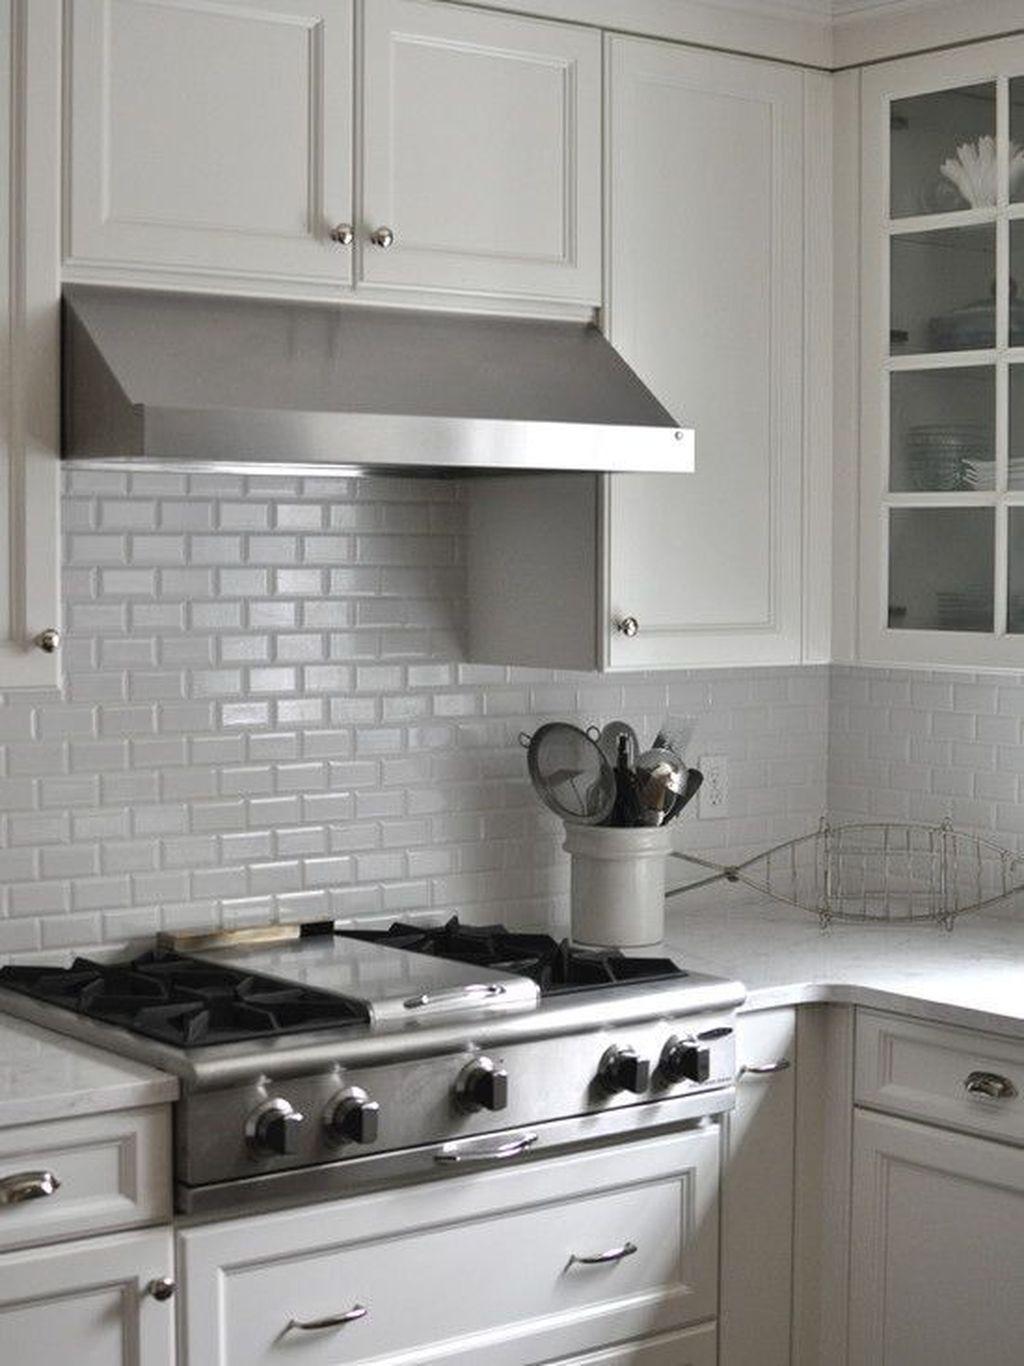 Stunning Glass Backsplash Kitchen Ideas 03